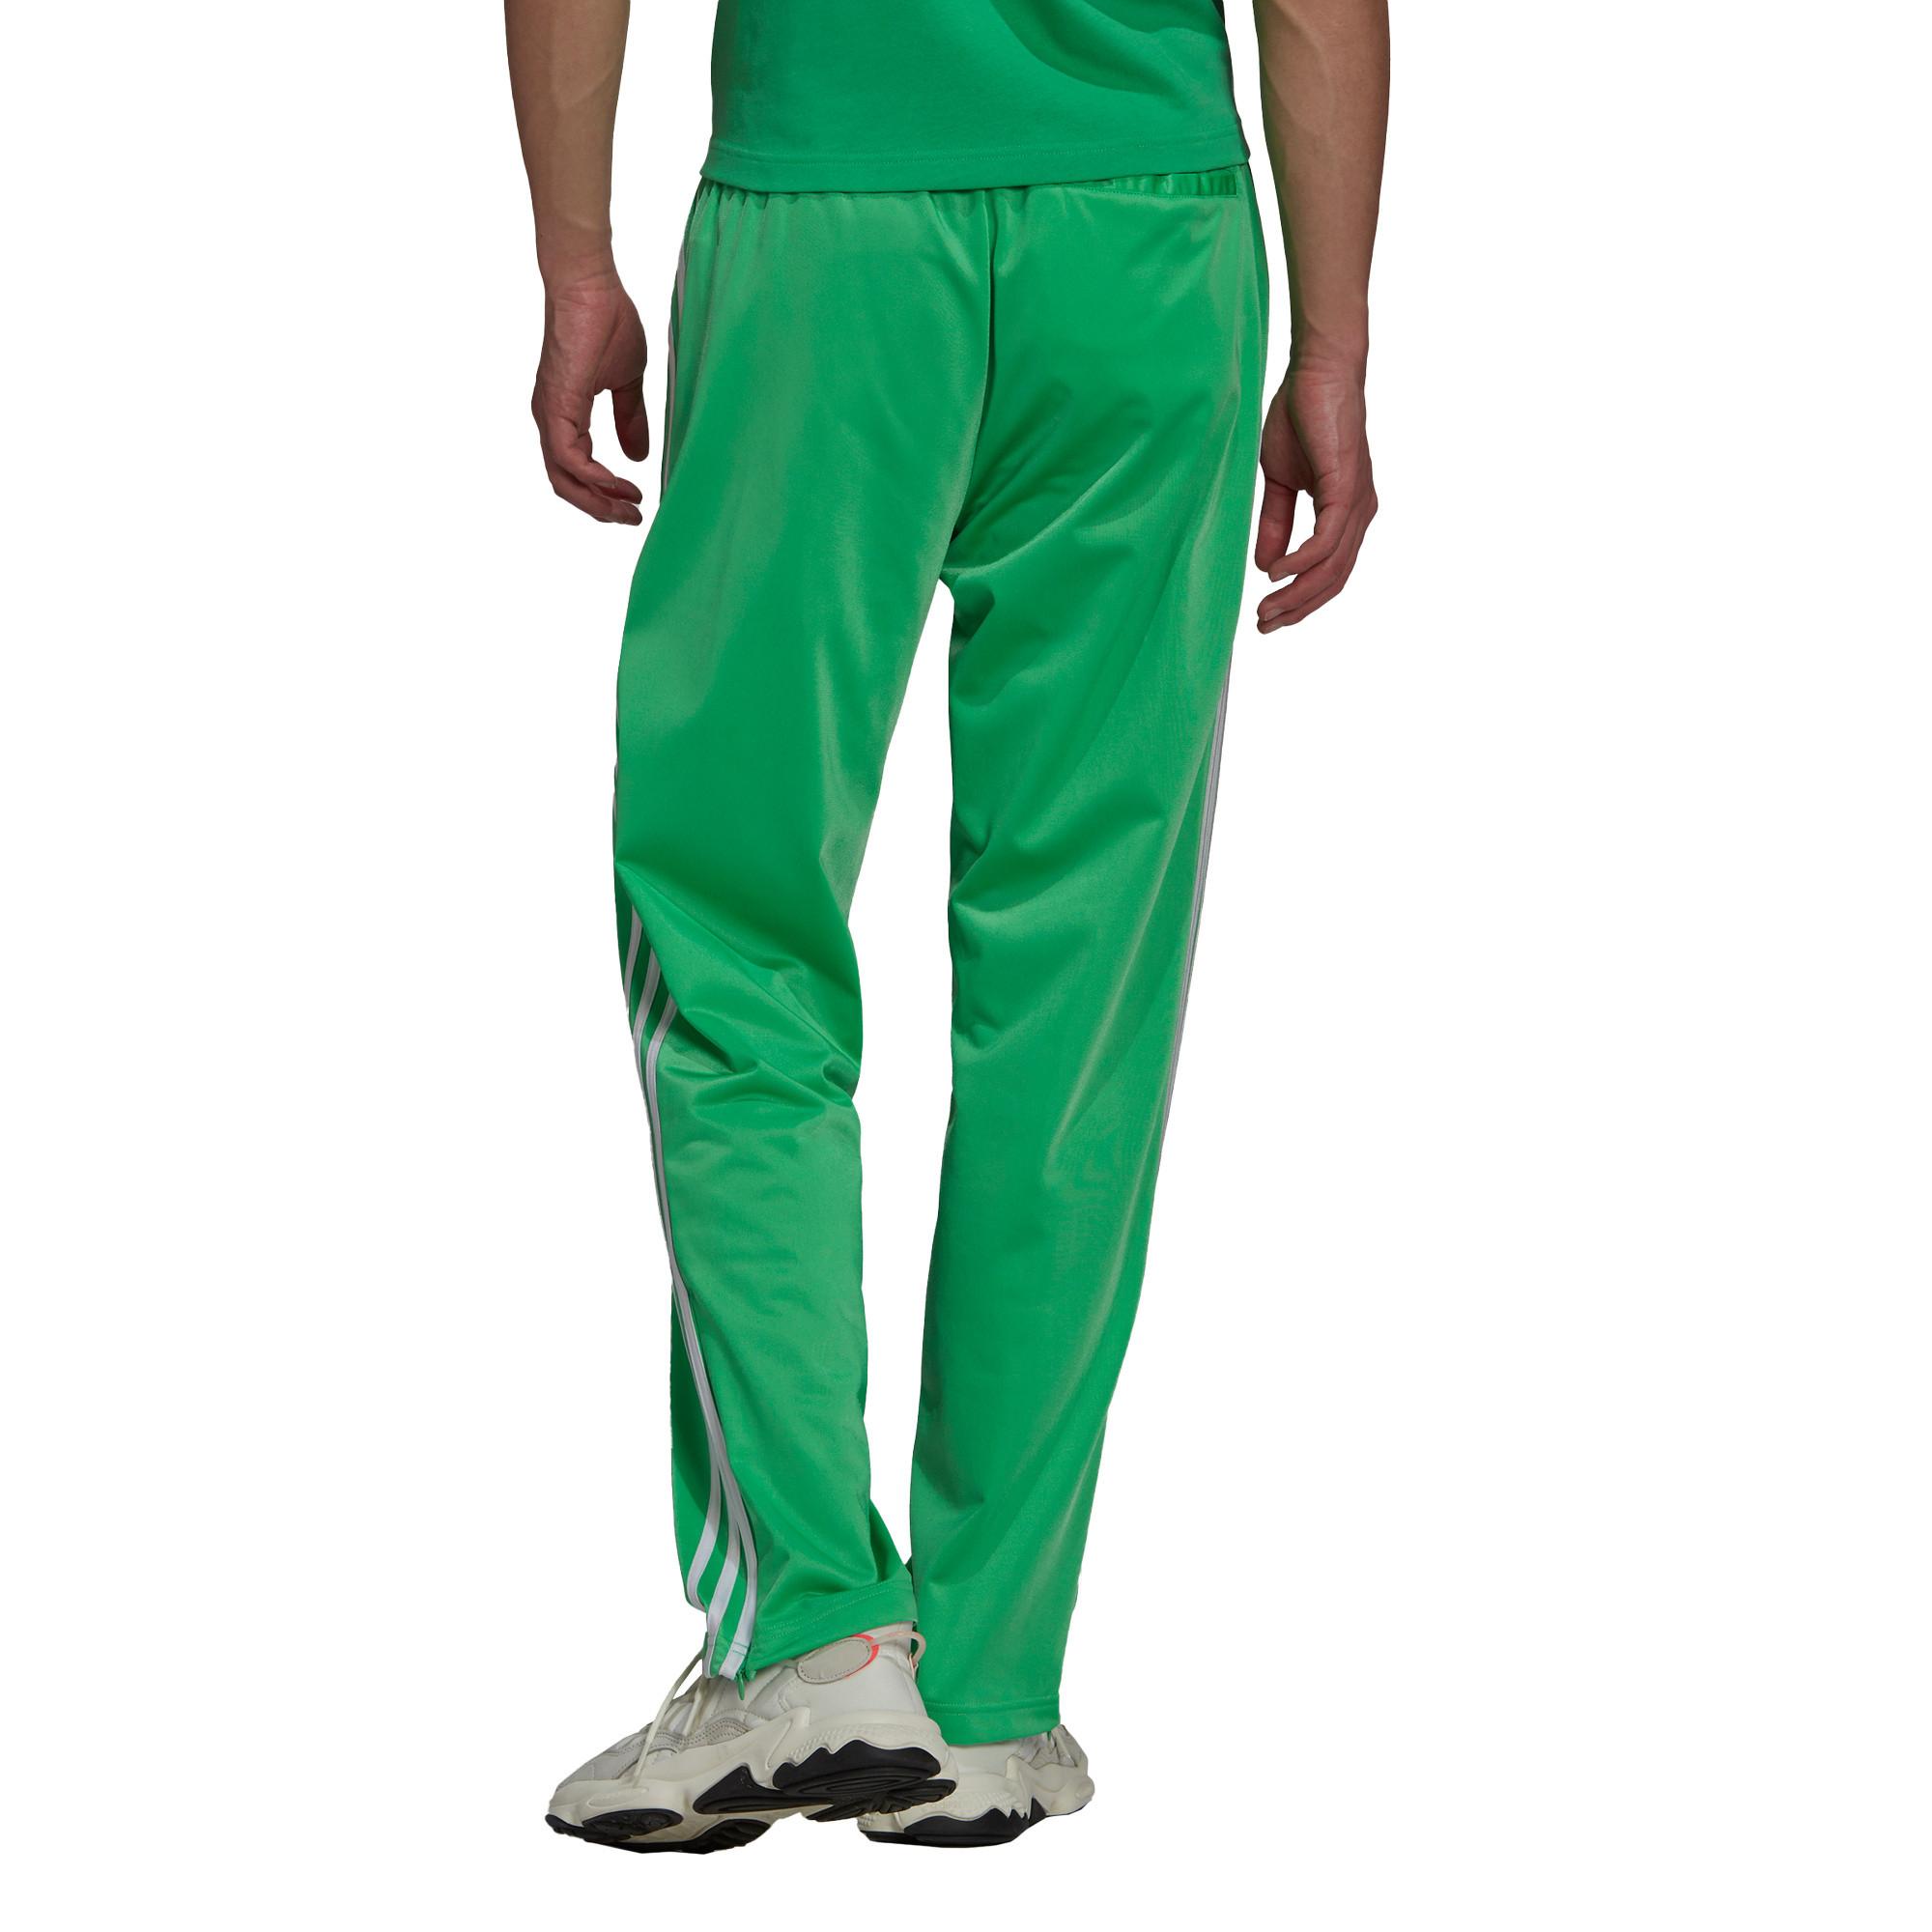 Pantaloni tuta uomo adicolor Classics Firebird Primeblue, Verde, large image number 1